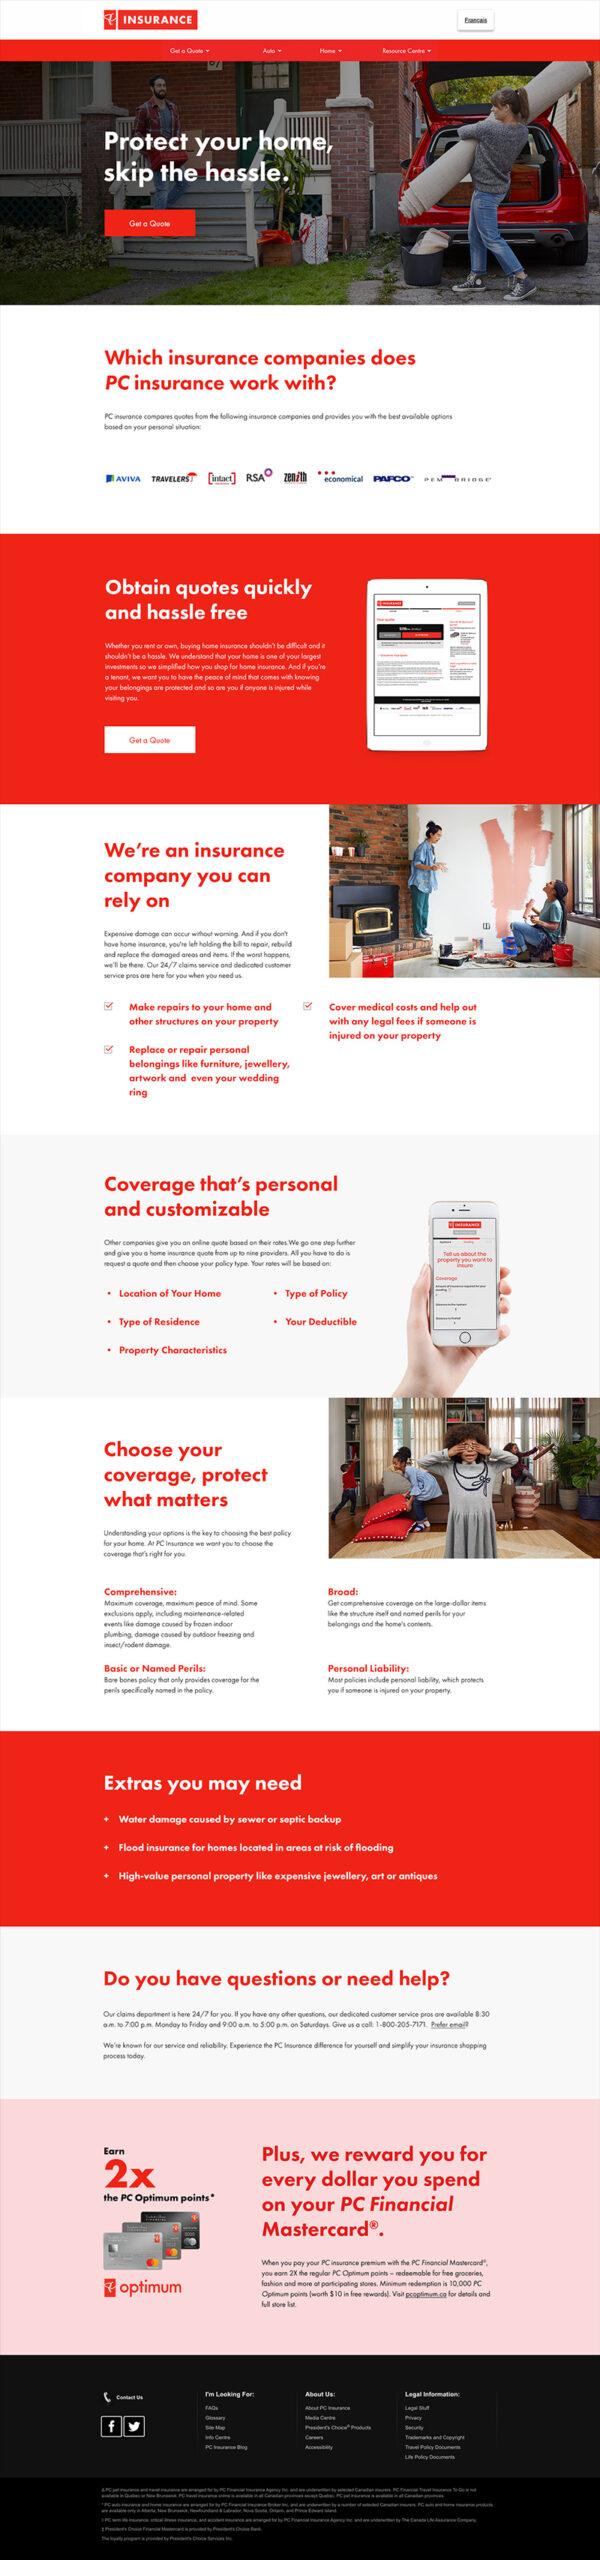 PC-Insurance_-Home-Insurance